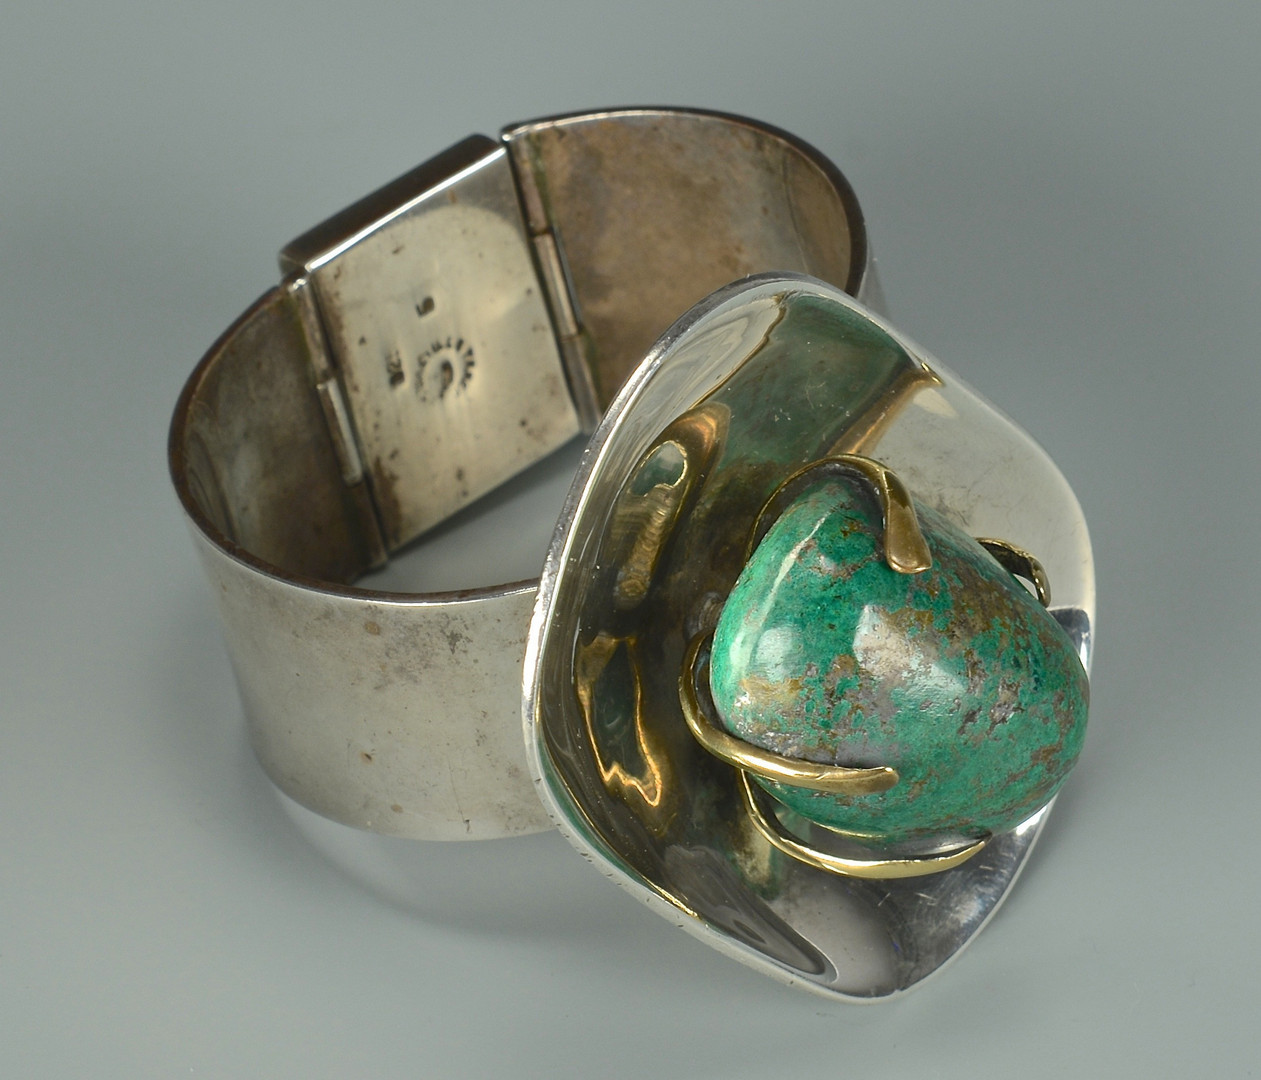 Lot 600: Los Castillo Sterling Bracelet w/ Turquoise Stone